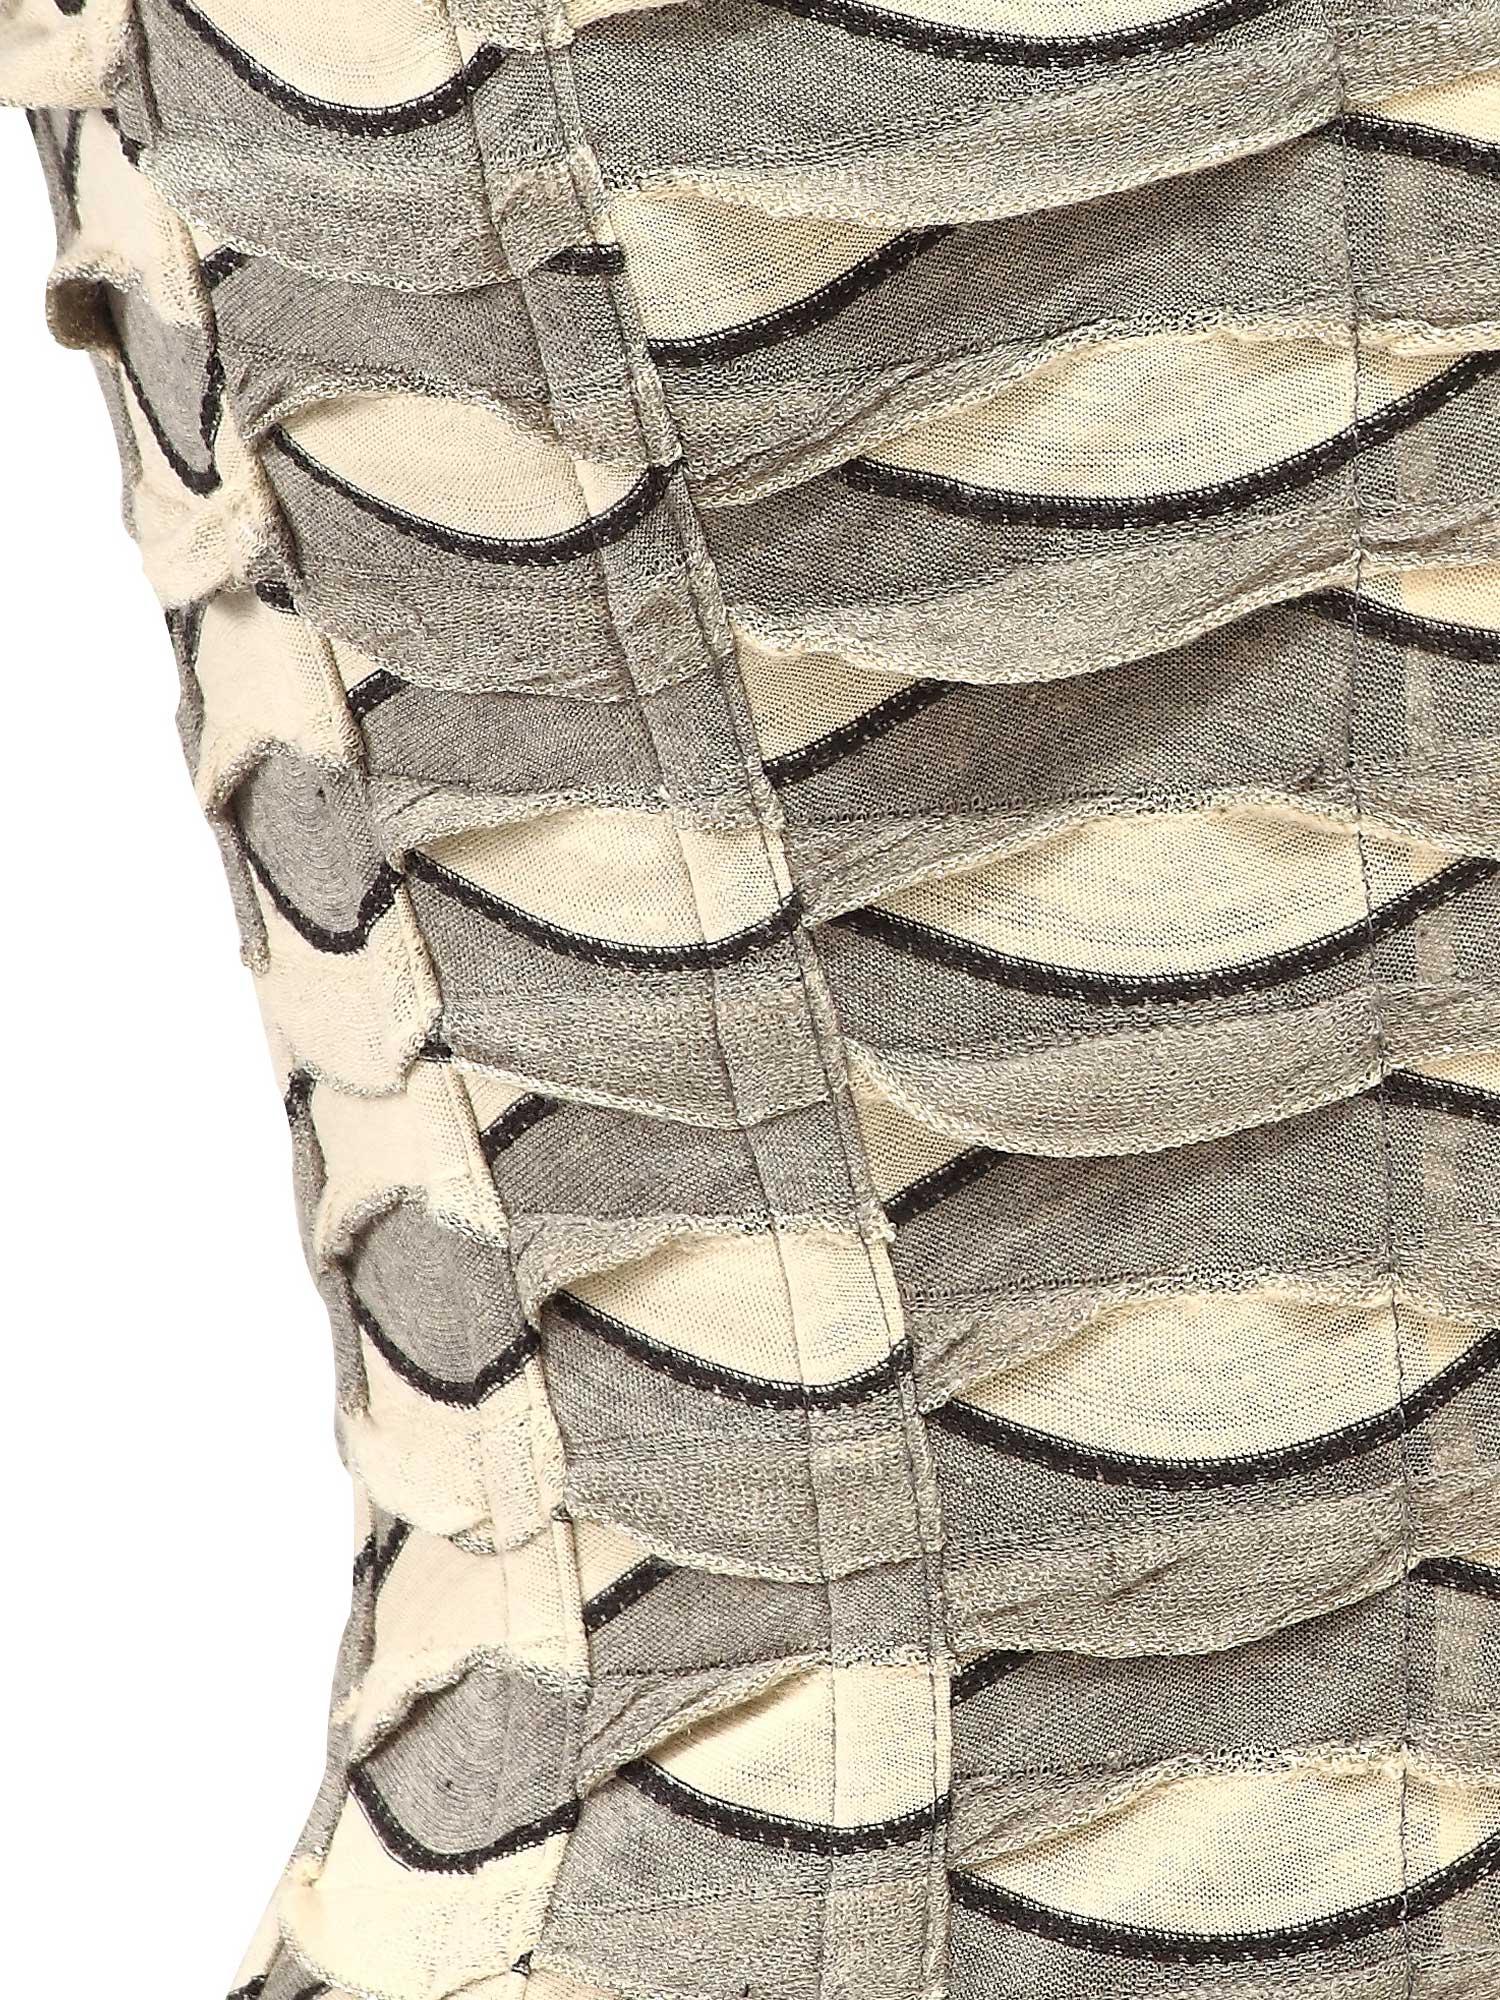 shredded_fabric_cutwork_steel_boning_corset_waist_cincher_bustier_bustiers_and_corsets_2.jpg